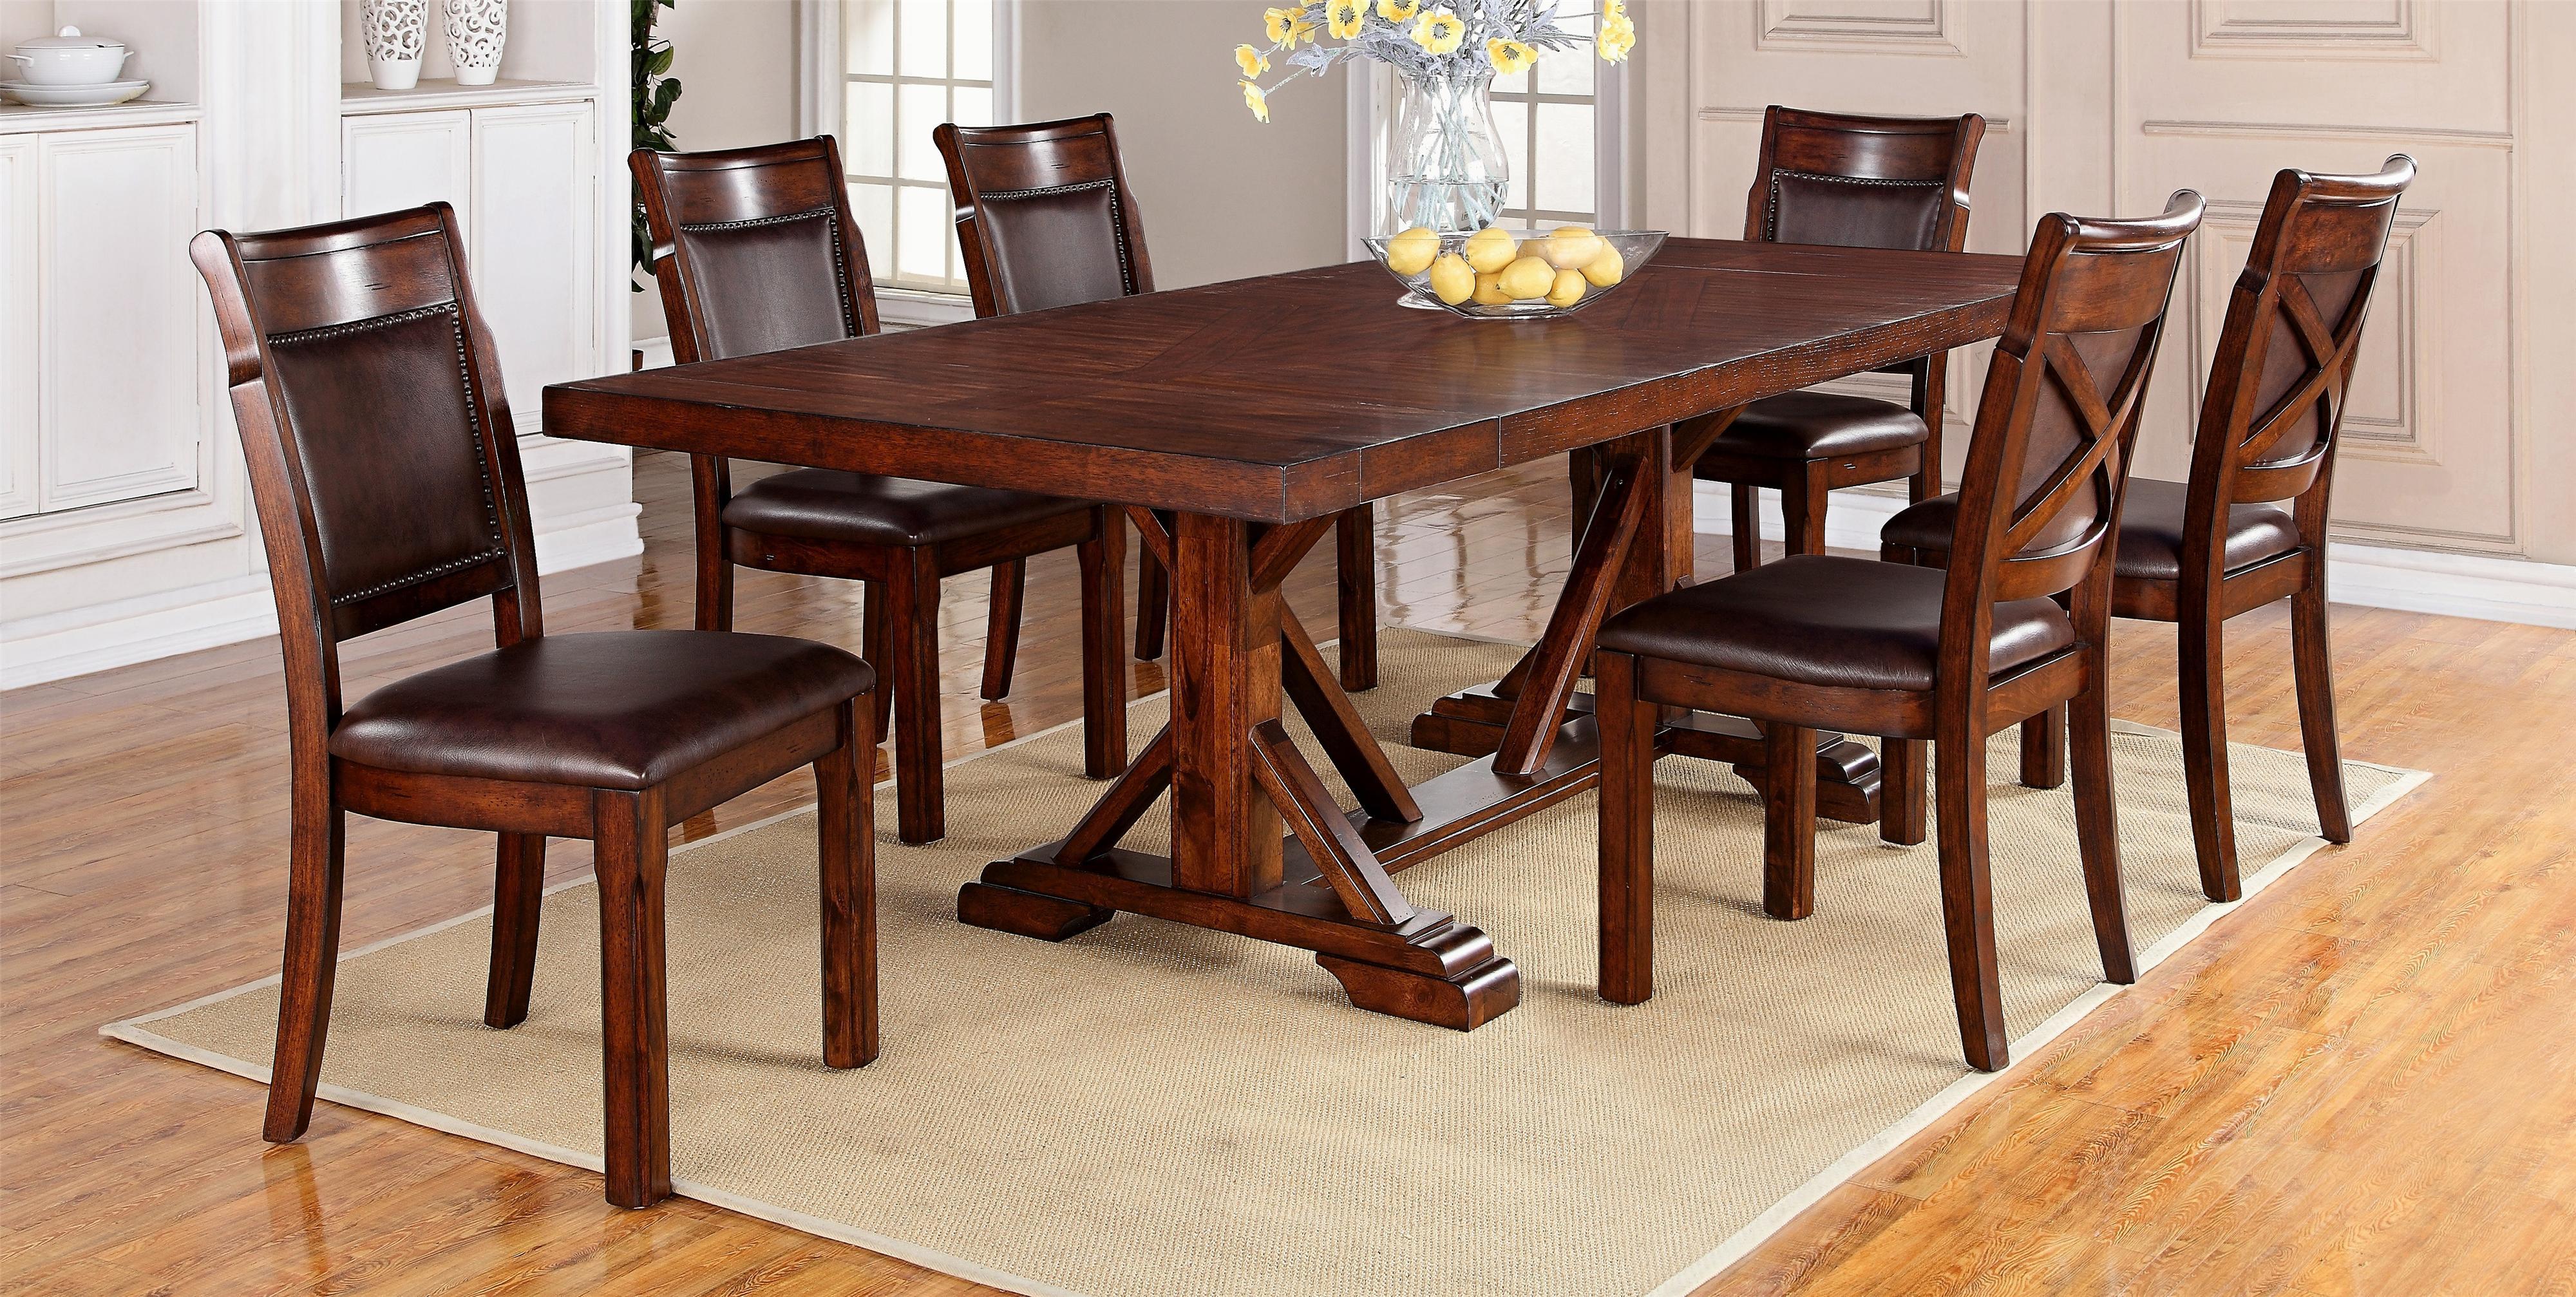 Adirondack 7-Piece Dining Table Set by Warehouse M at Pilgrim Furniture City